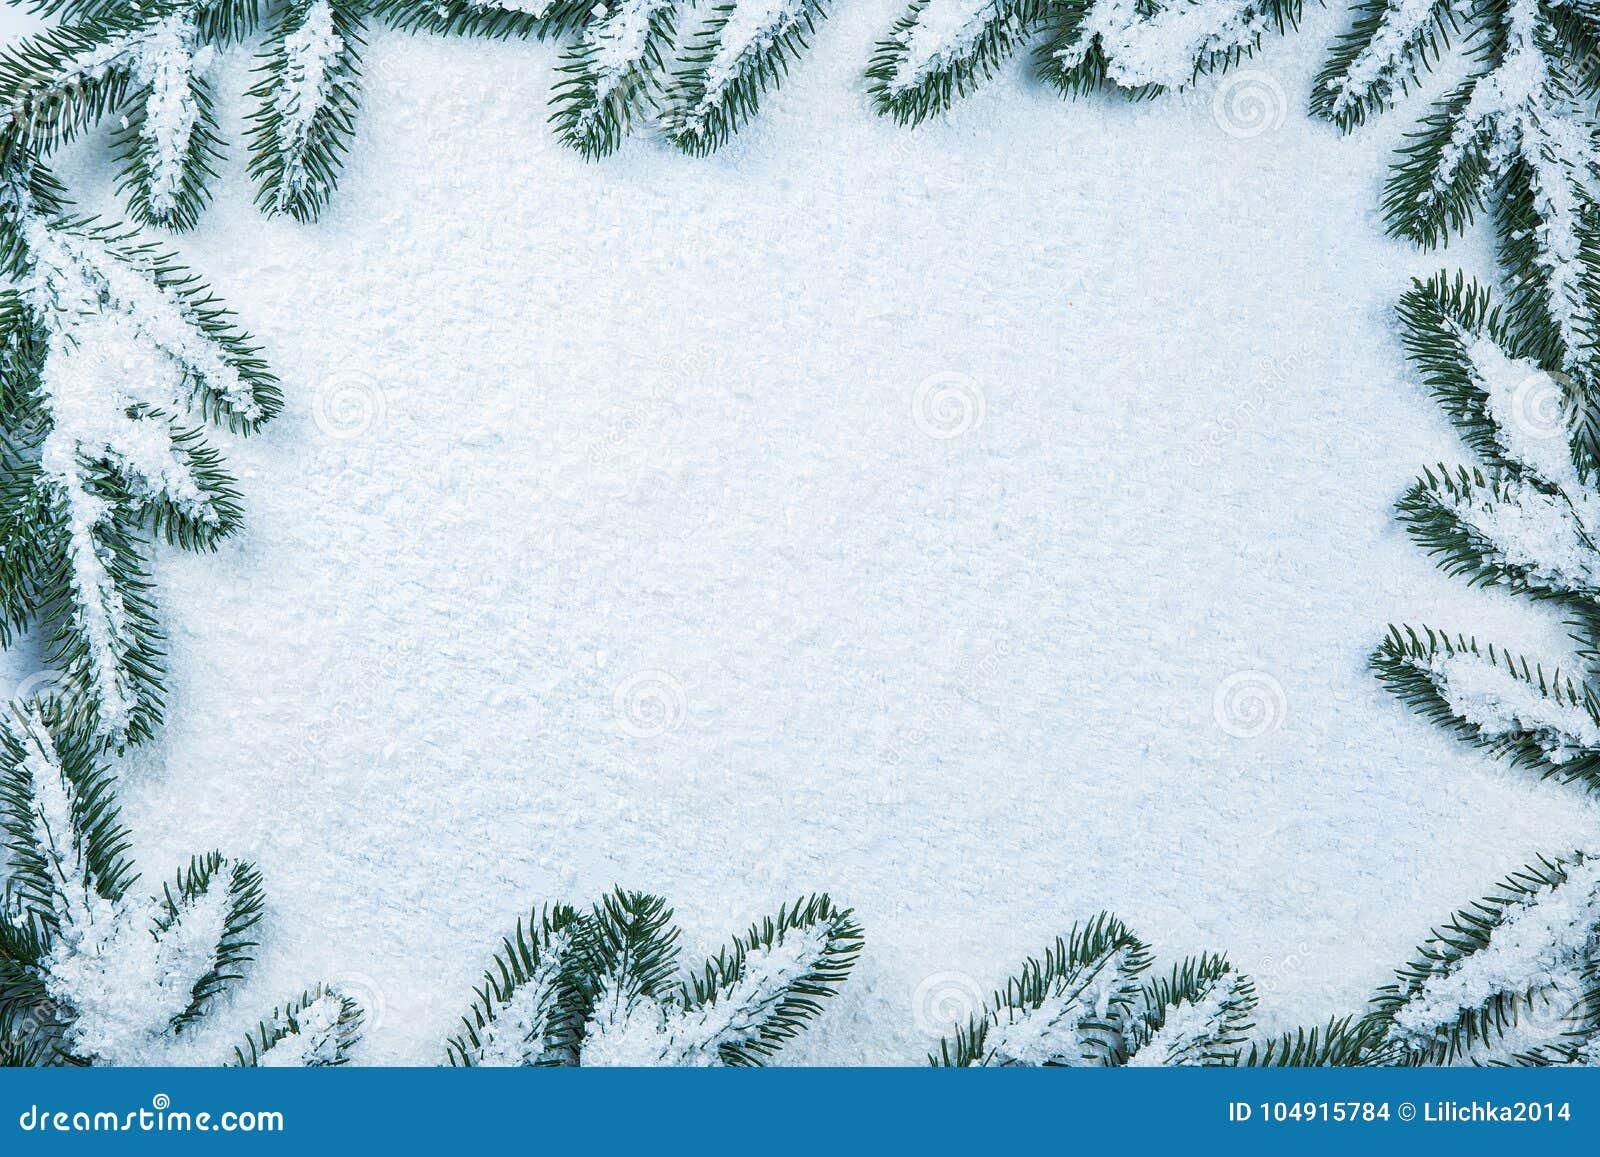 Christmas Fir Tree Frame On White Snow Stock Photo Image Of Empty